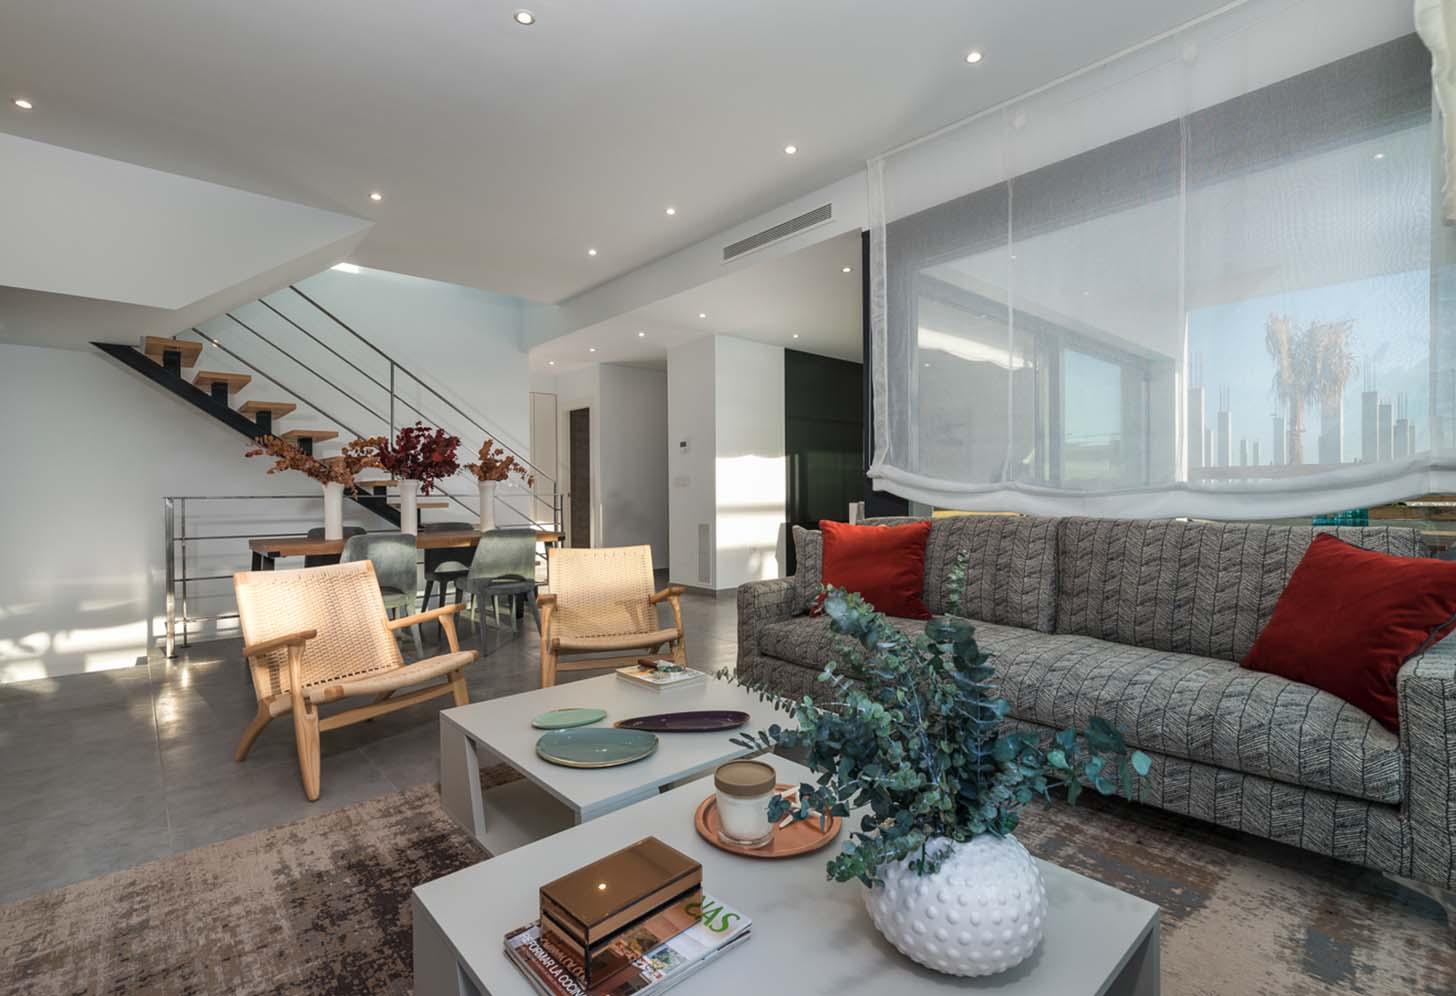 immobilier neuf espagne costa blanca sur alicante dolores salon